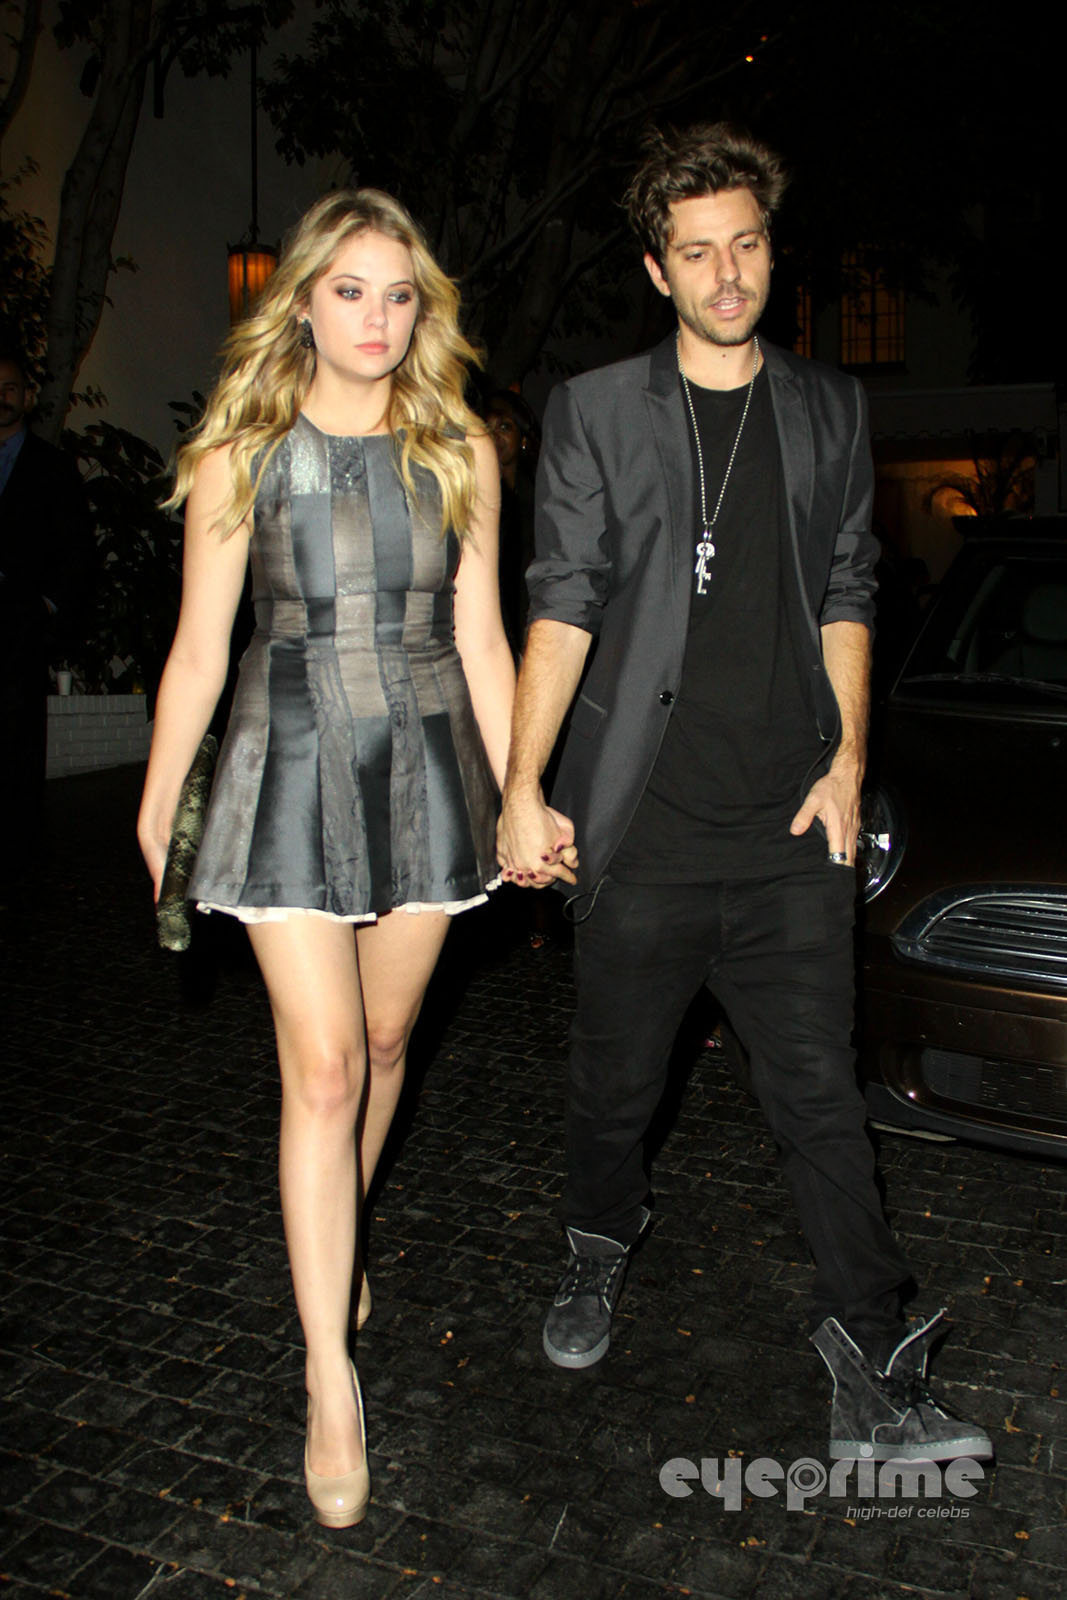 Cute Couple Hugging Wallpaper Ashley Benson S New Boyfriend 2011 My 24news And